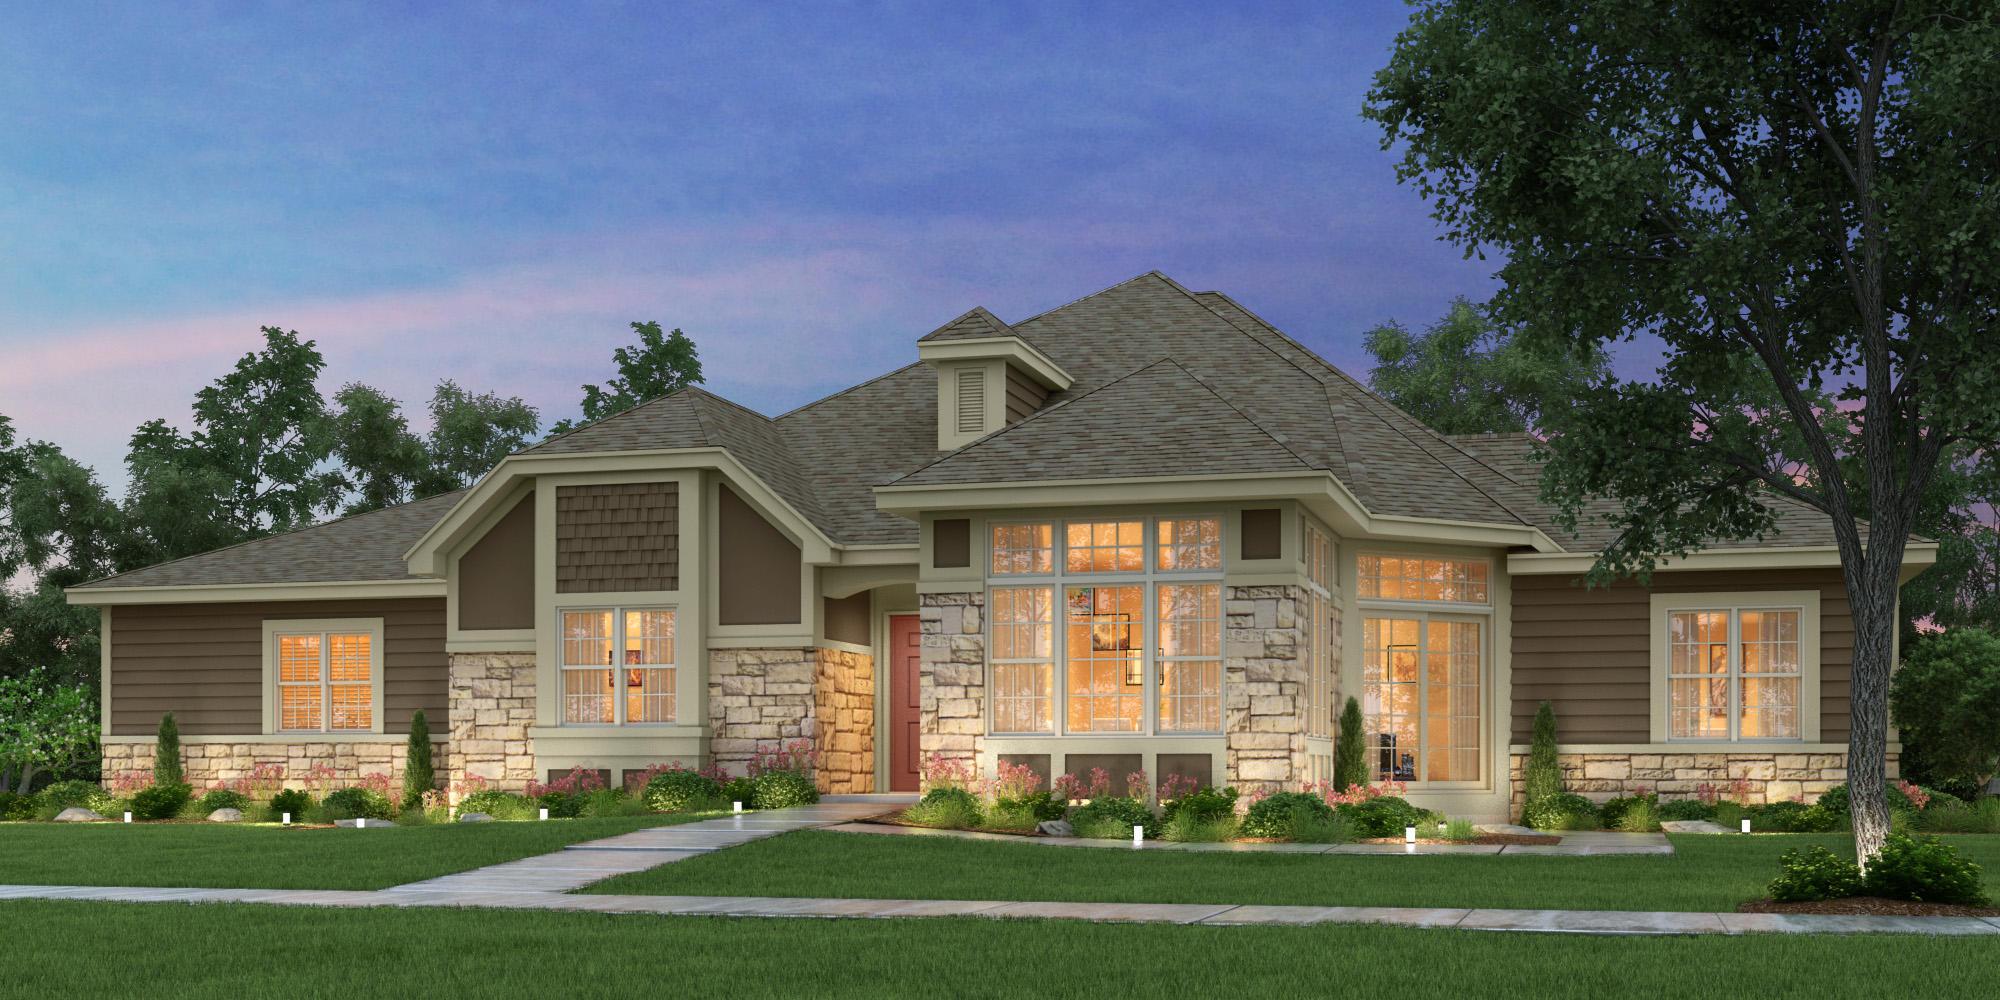 13735 Creekside Pass, Brookfield, Wisconsin 53005, 2 Bedrooms Bedrooms, 7 Rooms Rooms,2 BathroomsBathrooms,Condominiums,For Sale,Creekside Pass,1,1711946